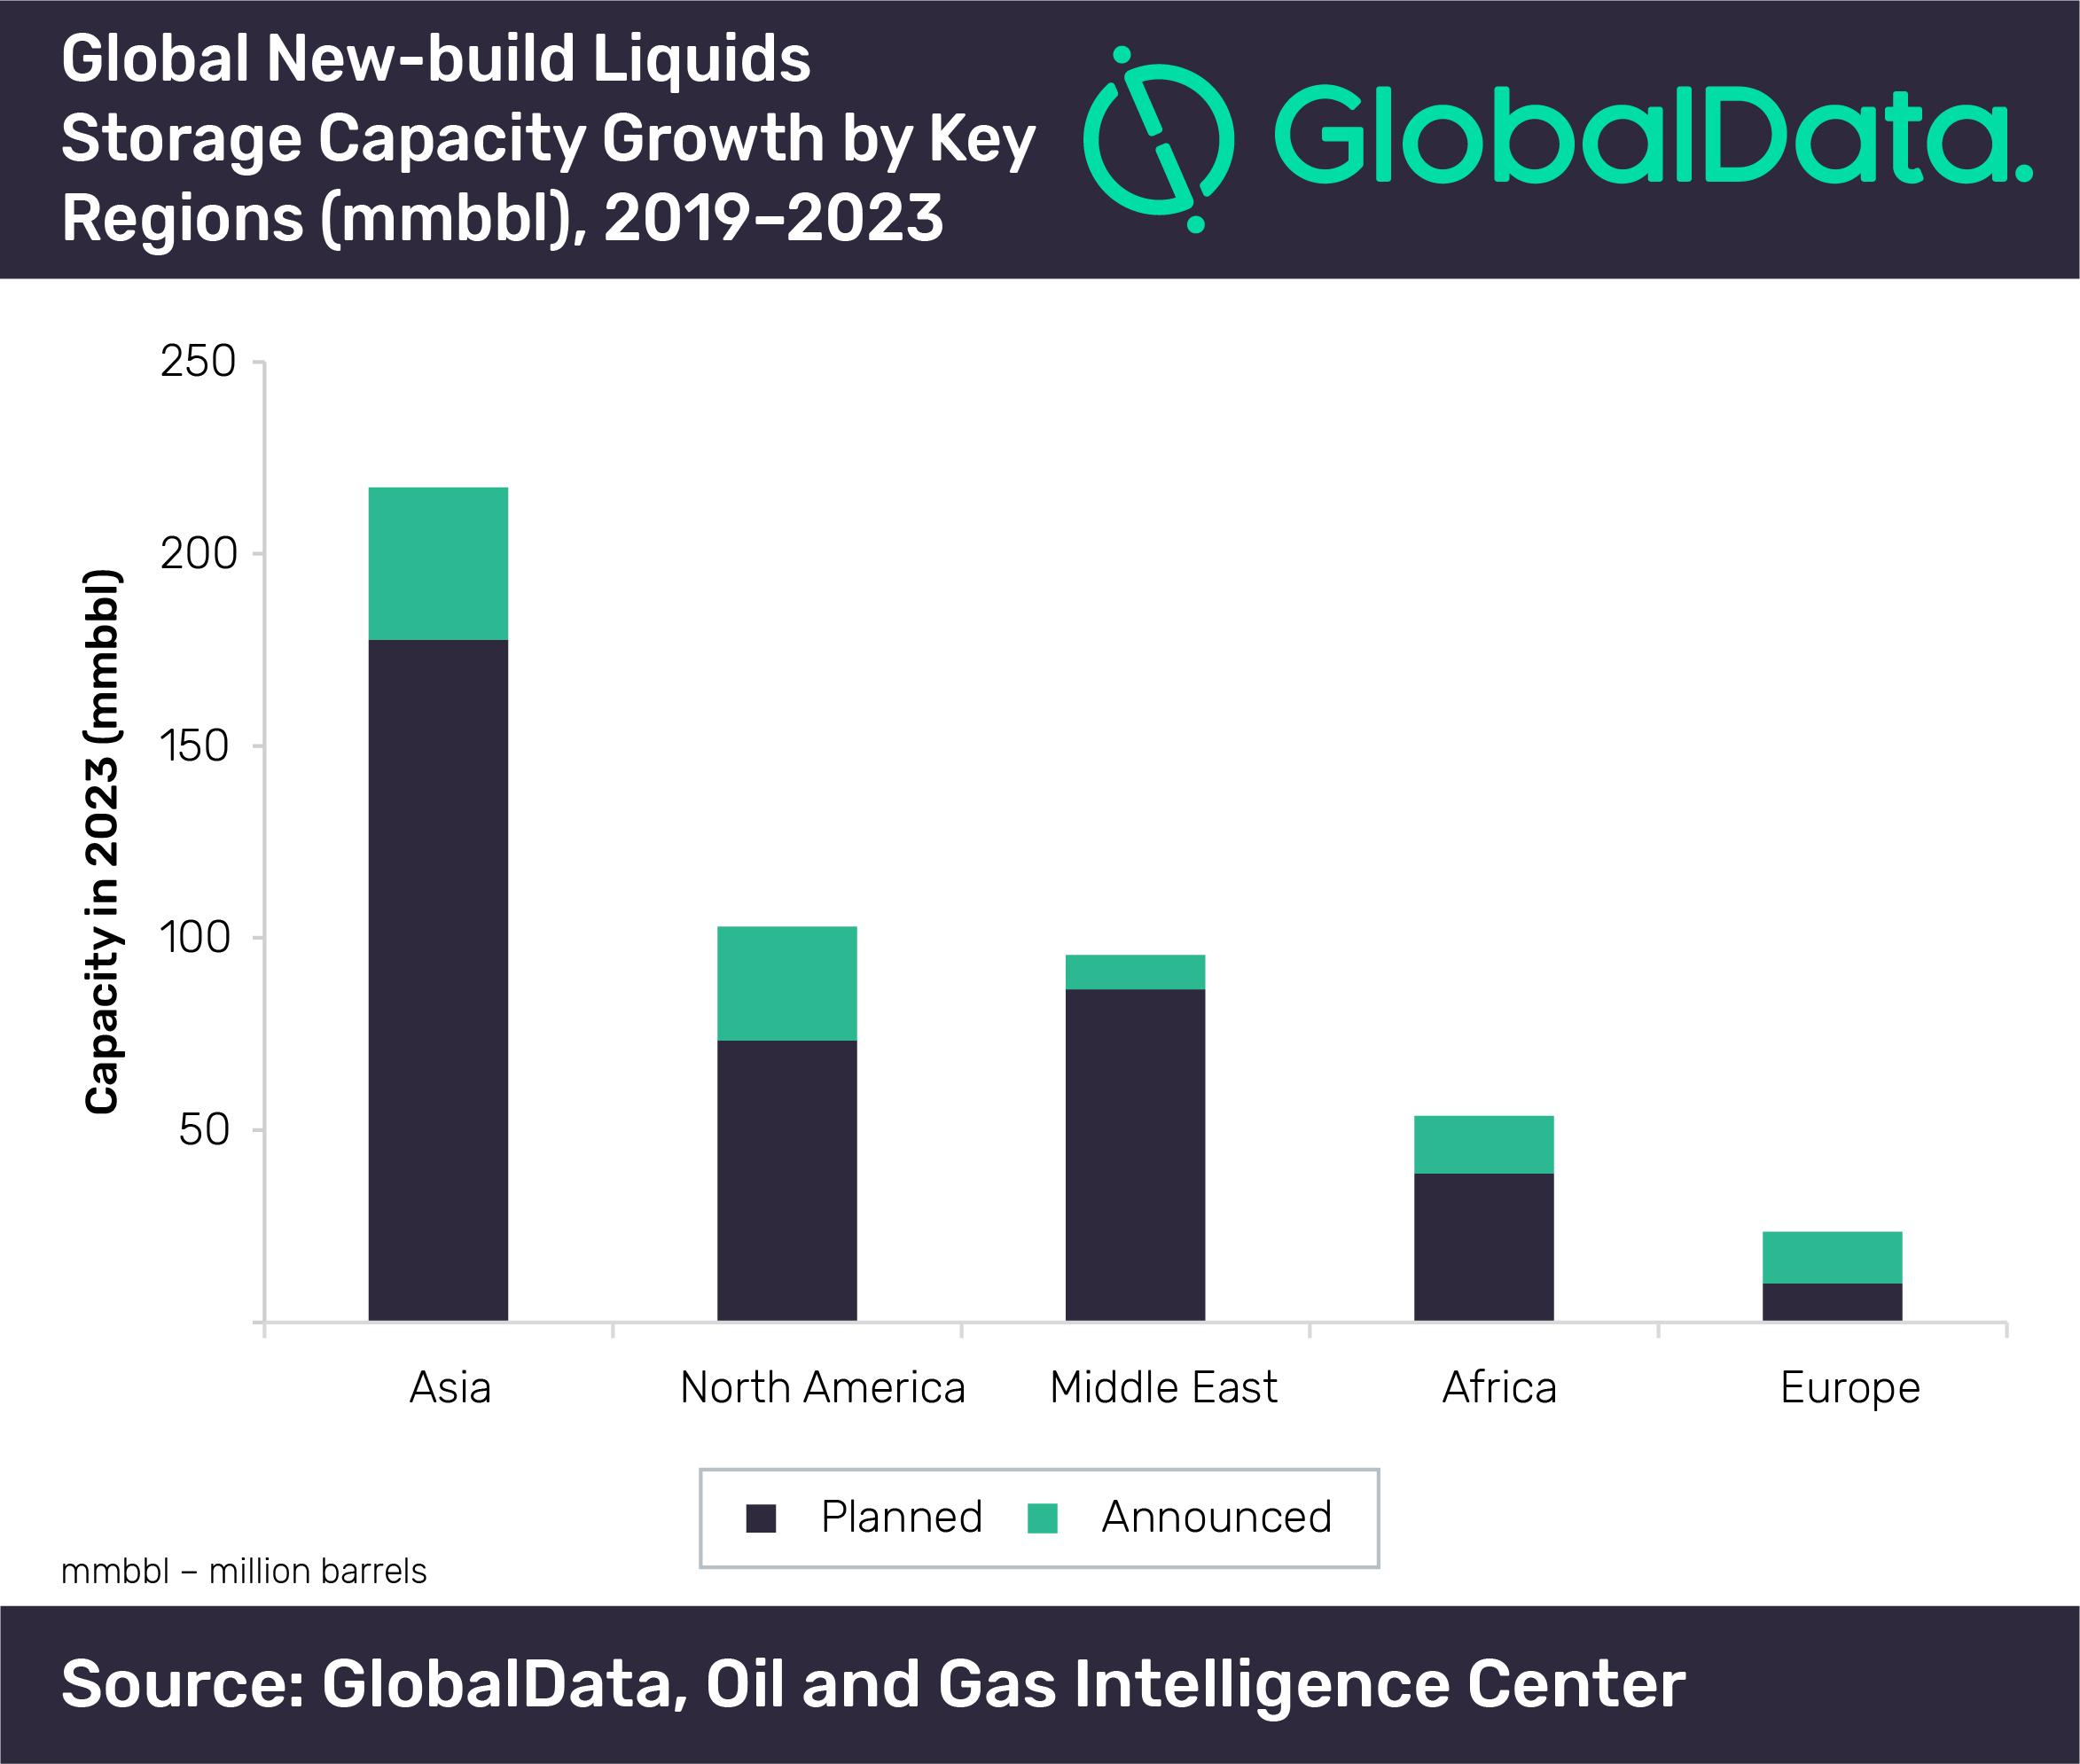 New-Build Liquid Storage Capacity Growth by Region